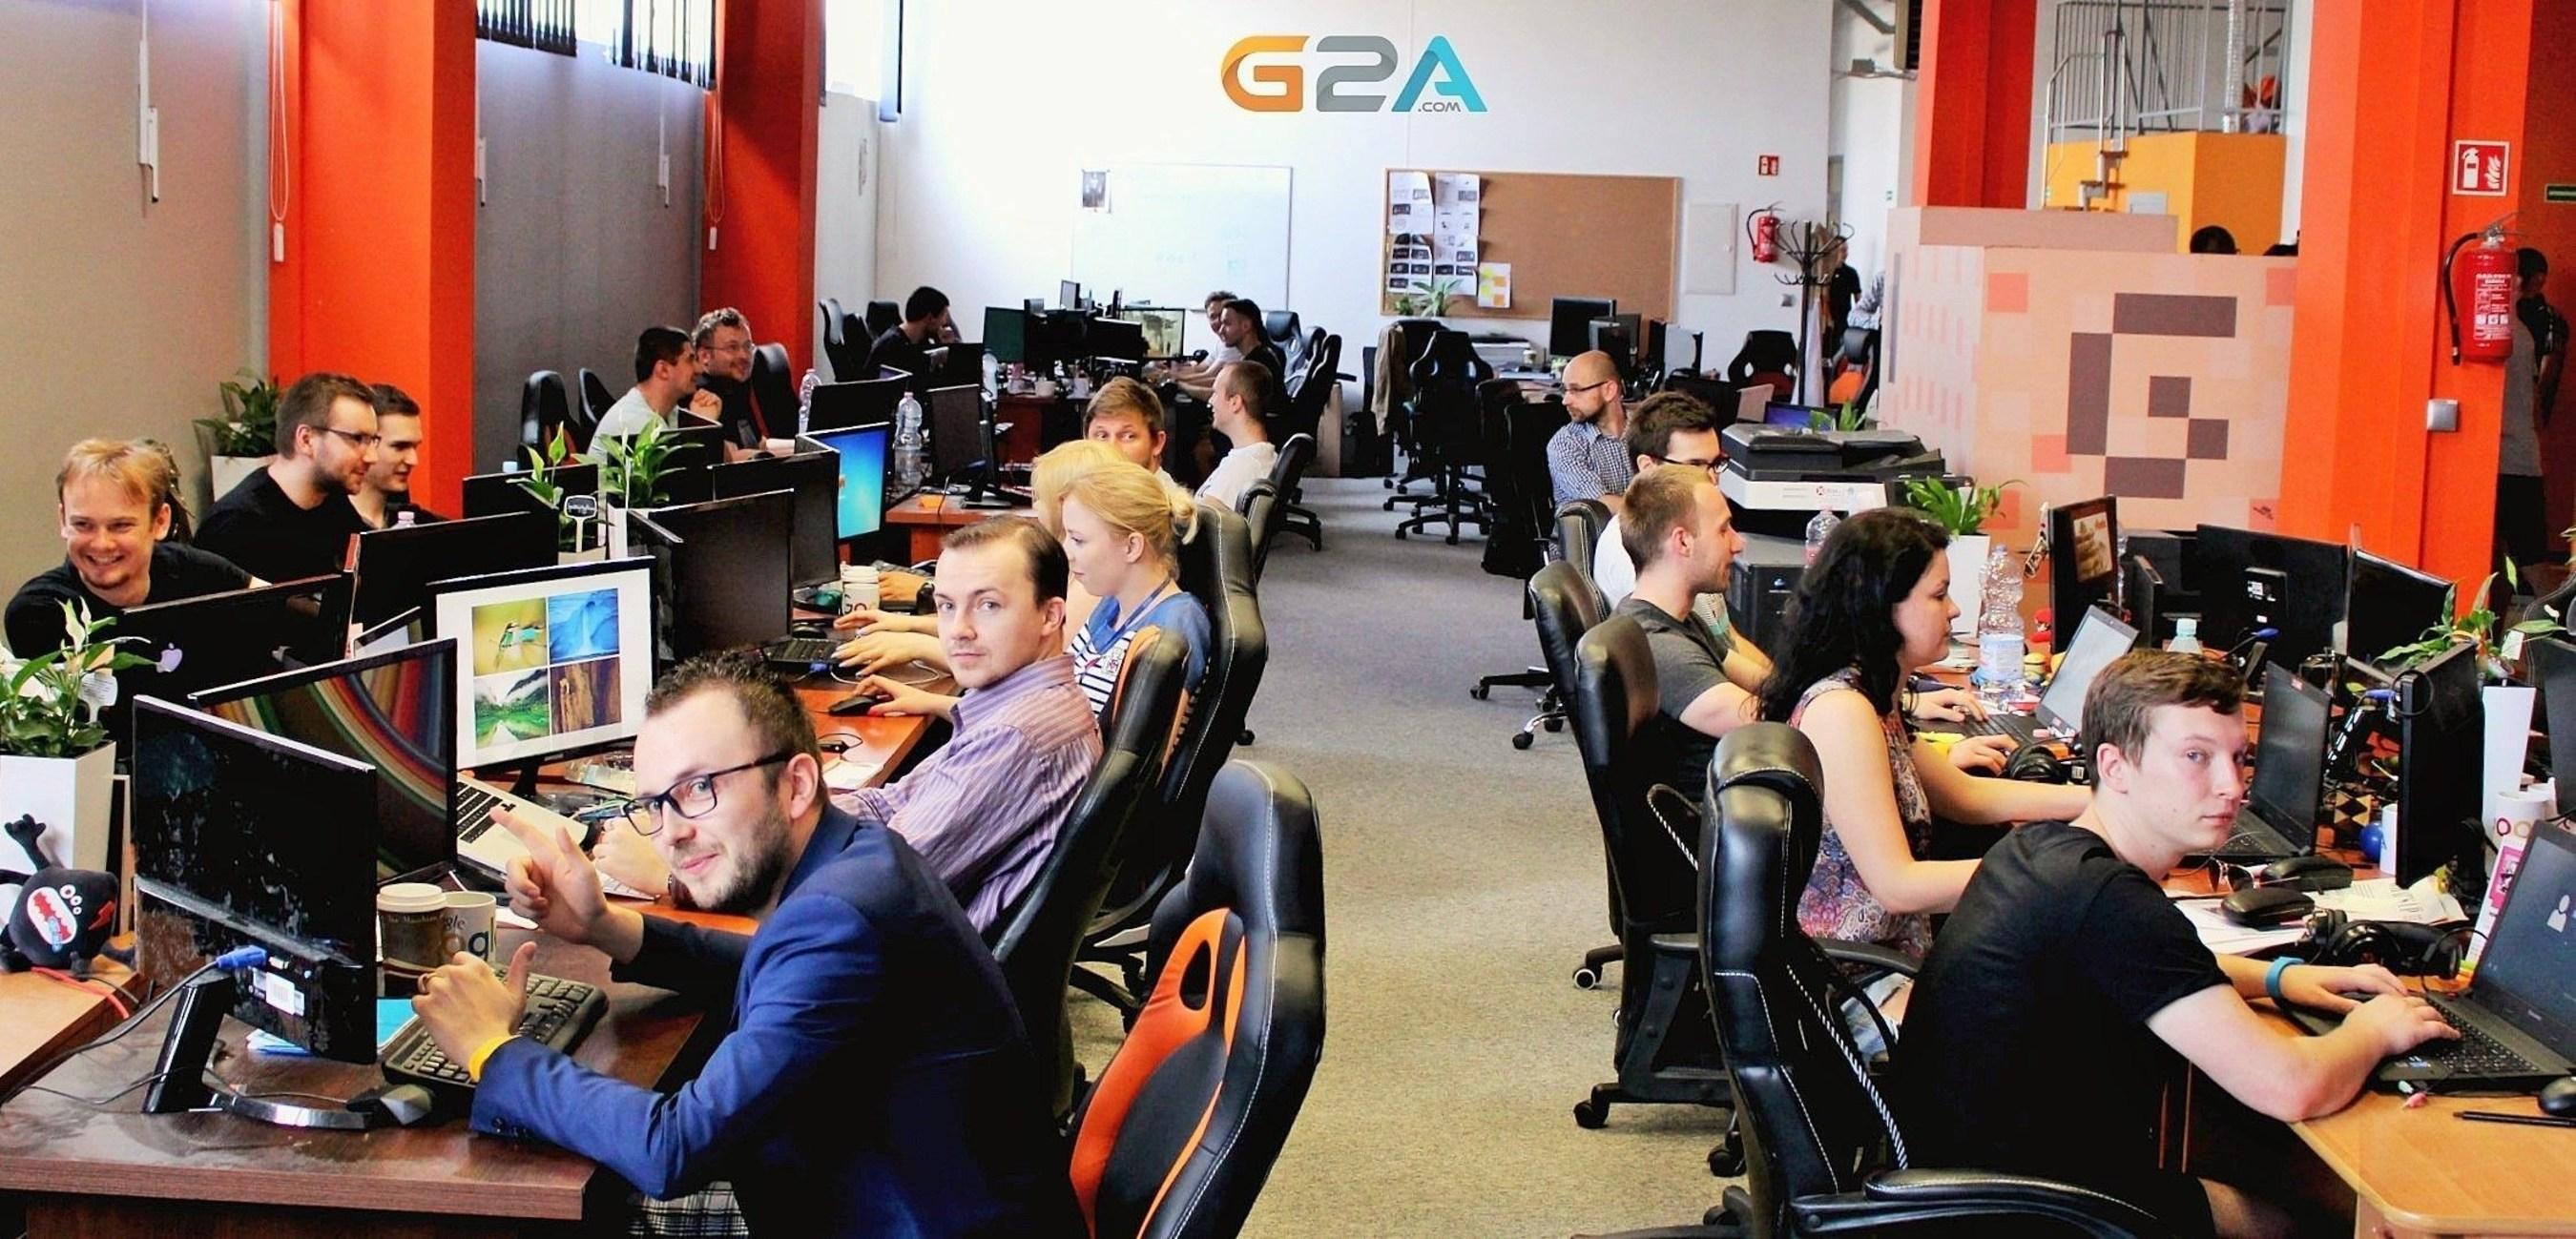 Some members of the G2A Developer Support Teams (PRNewsFoto/G2A.com)